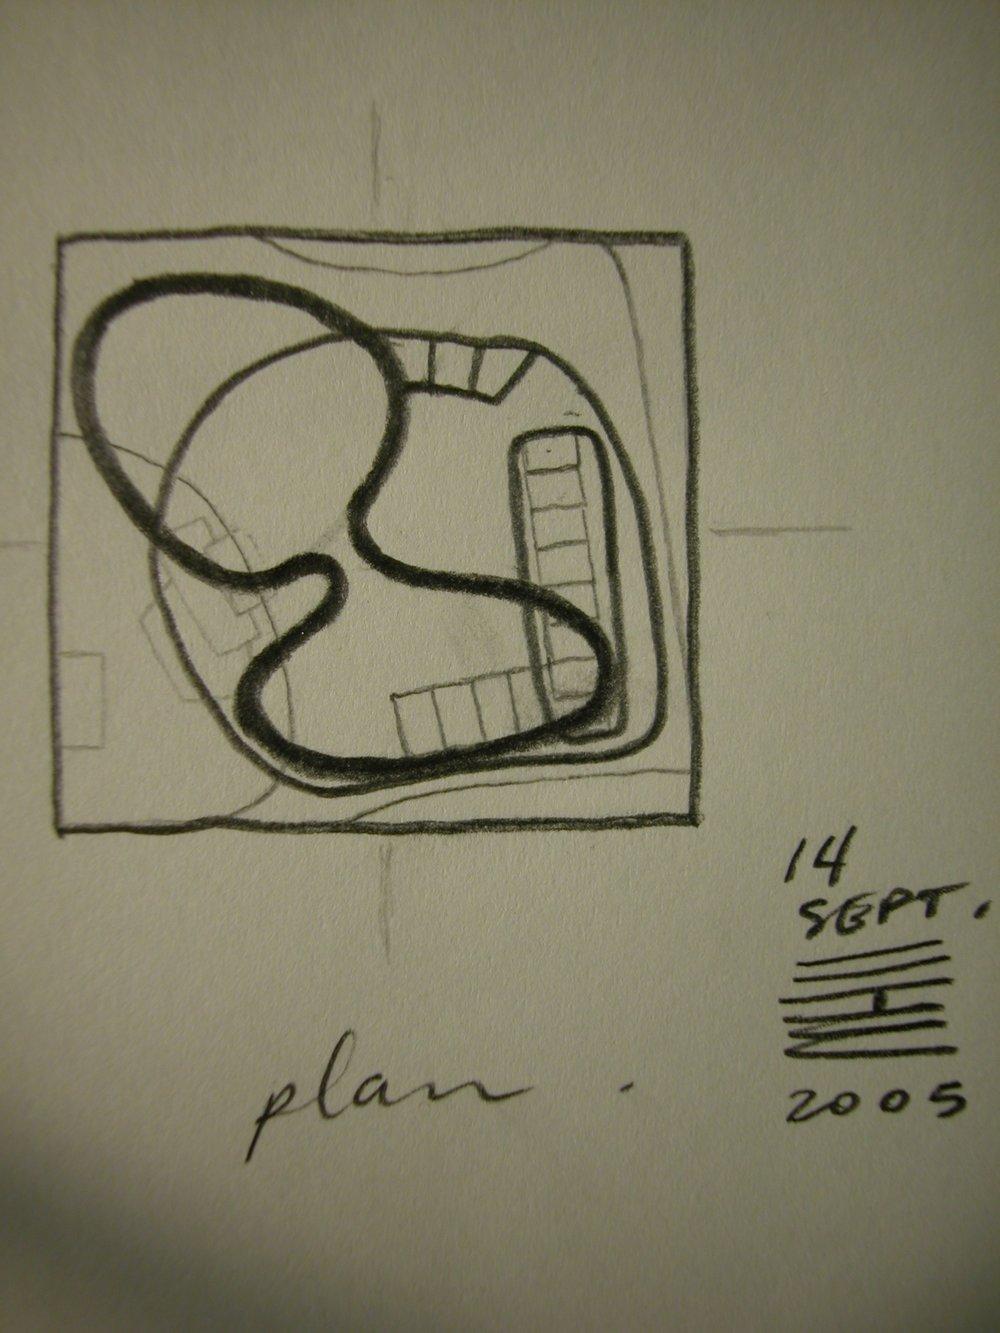 initial+plan.jpg